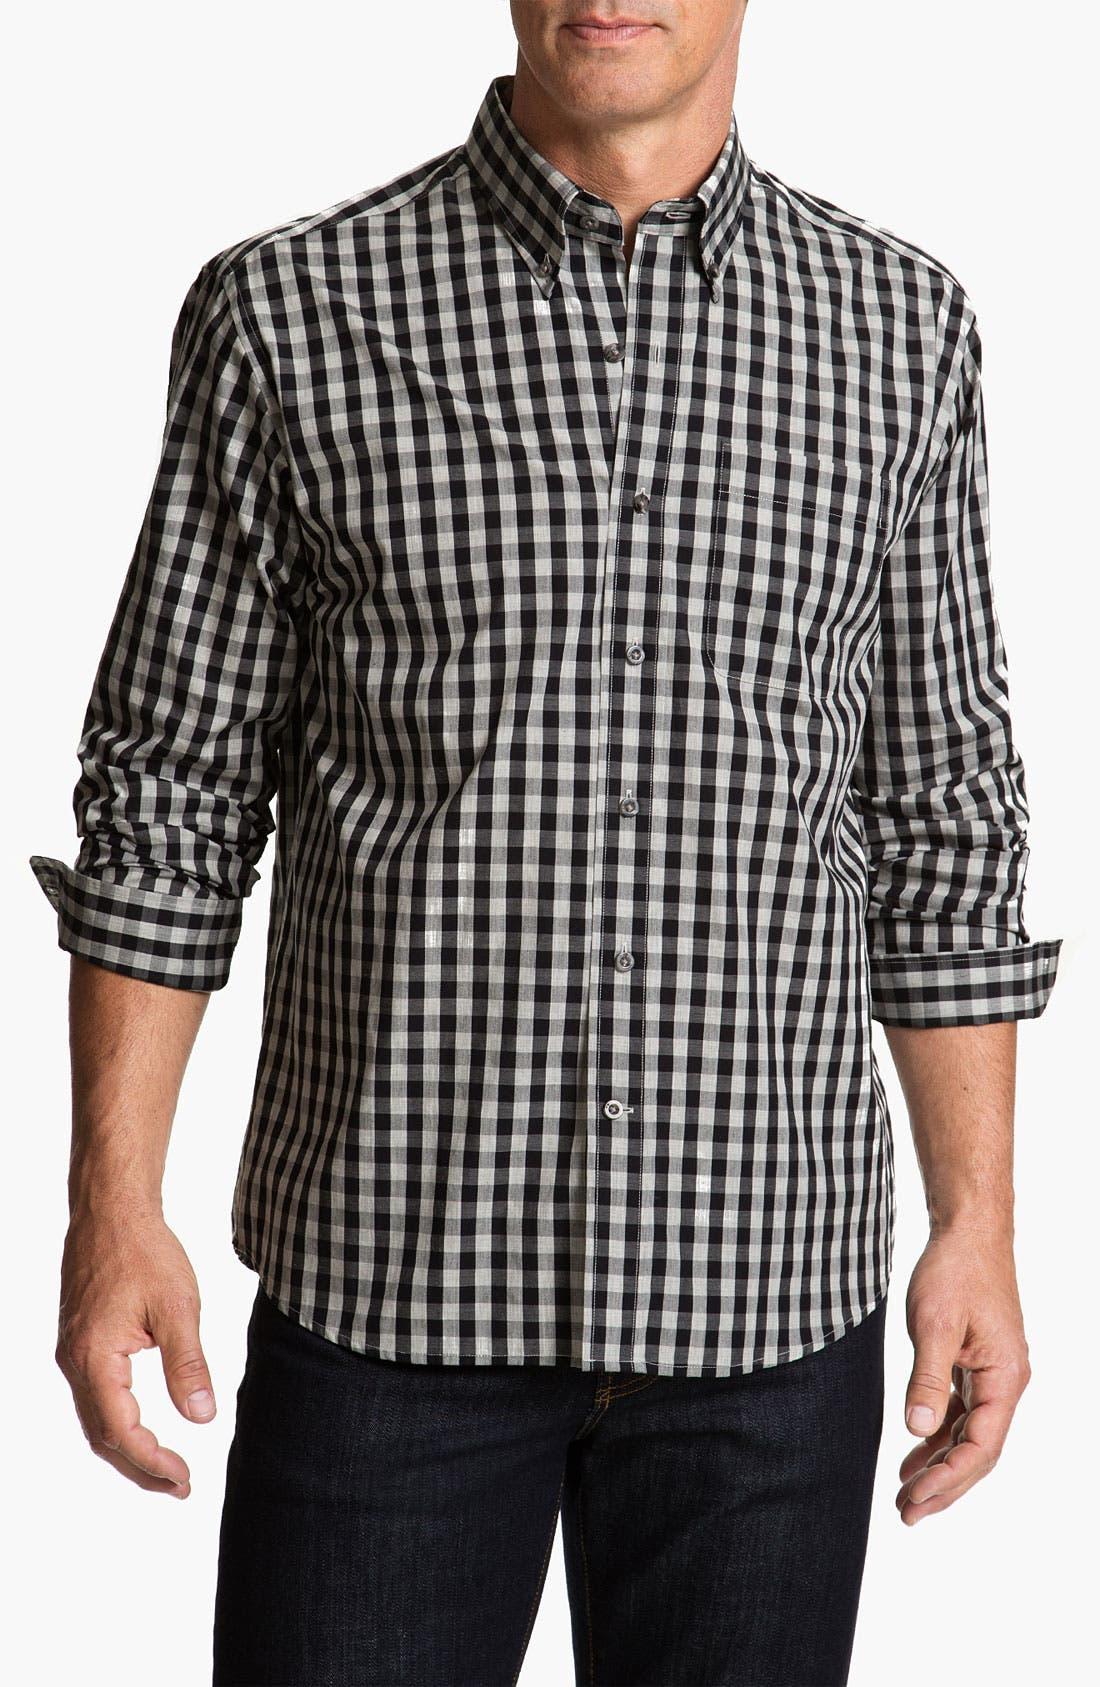 Main Image - Cutter & Buck 'Tusk' Check Sport Shirt (Big & Tall)